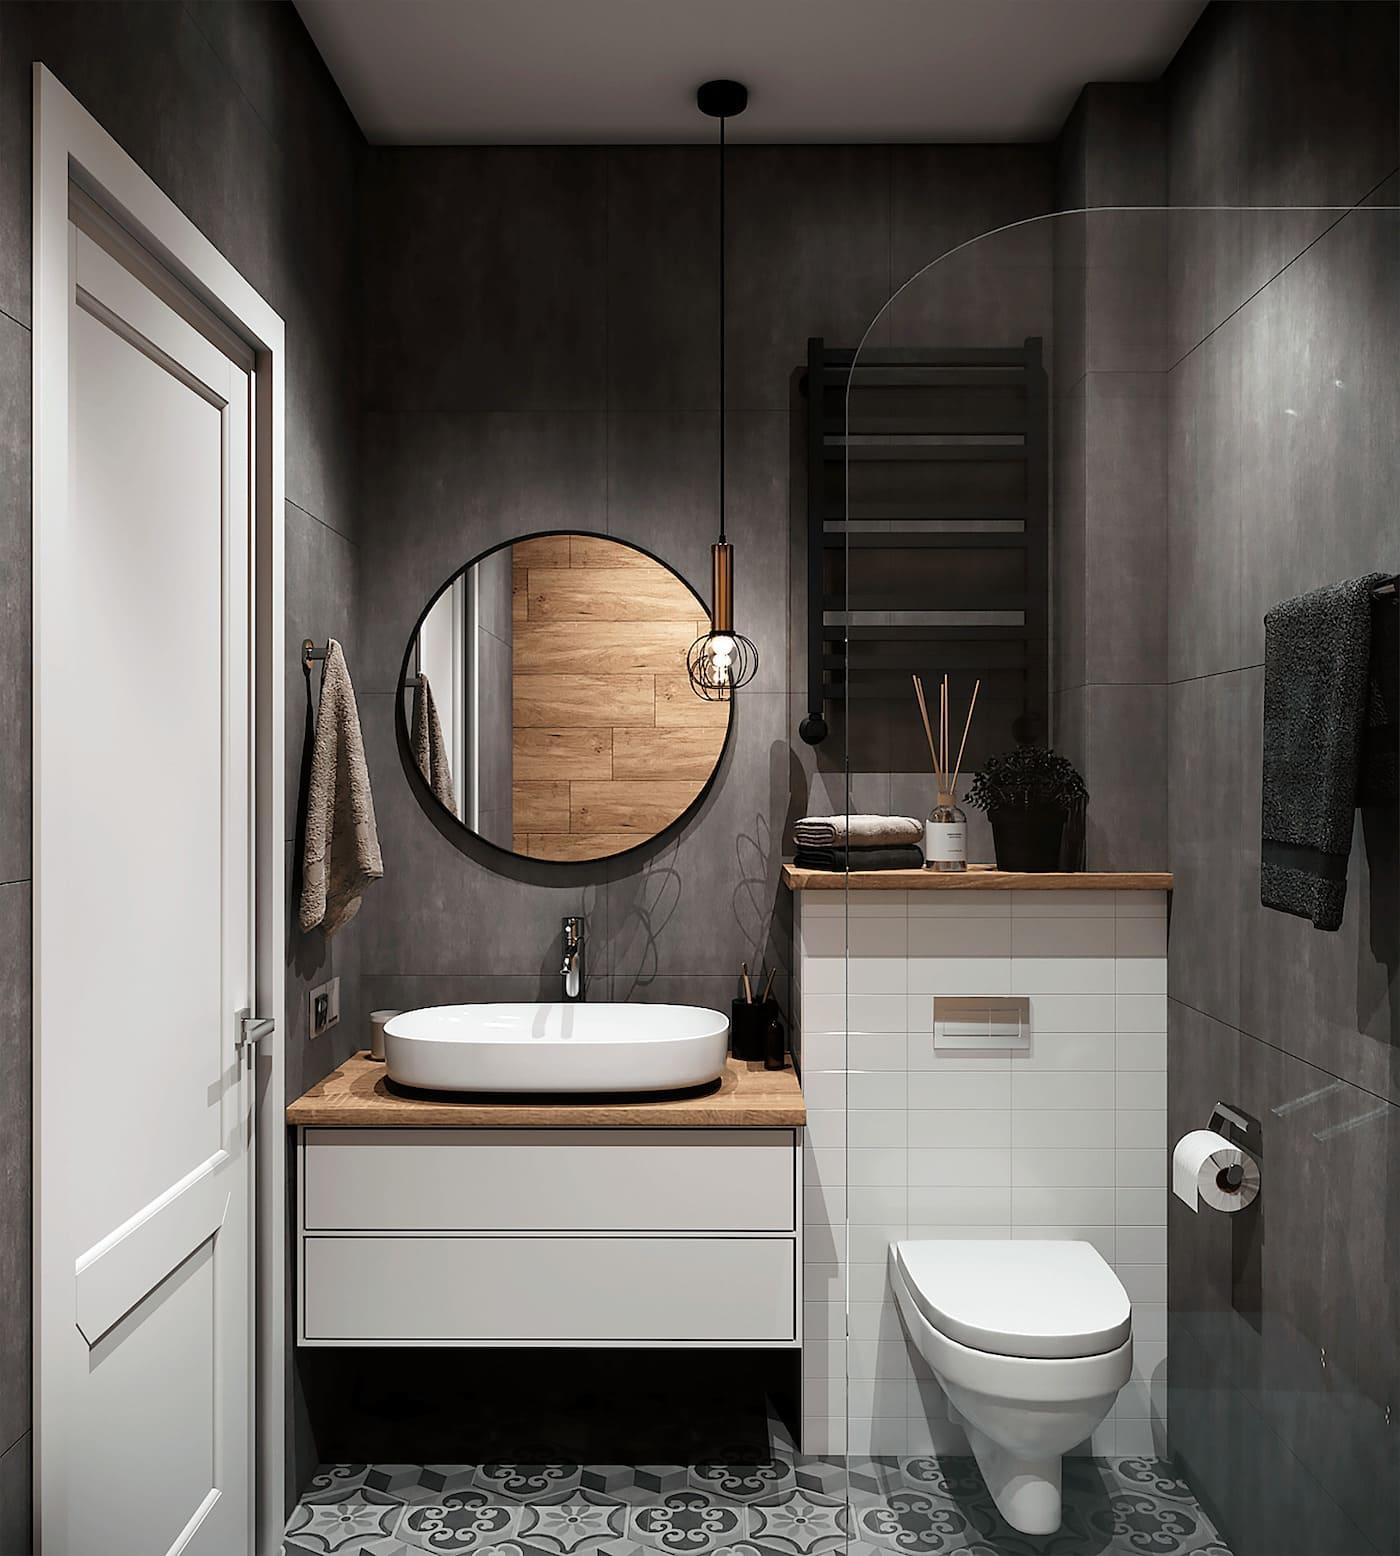 дизайн однокомнатной квартиры фото 28